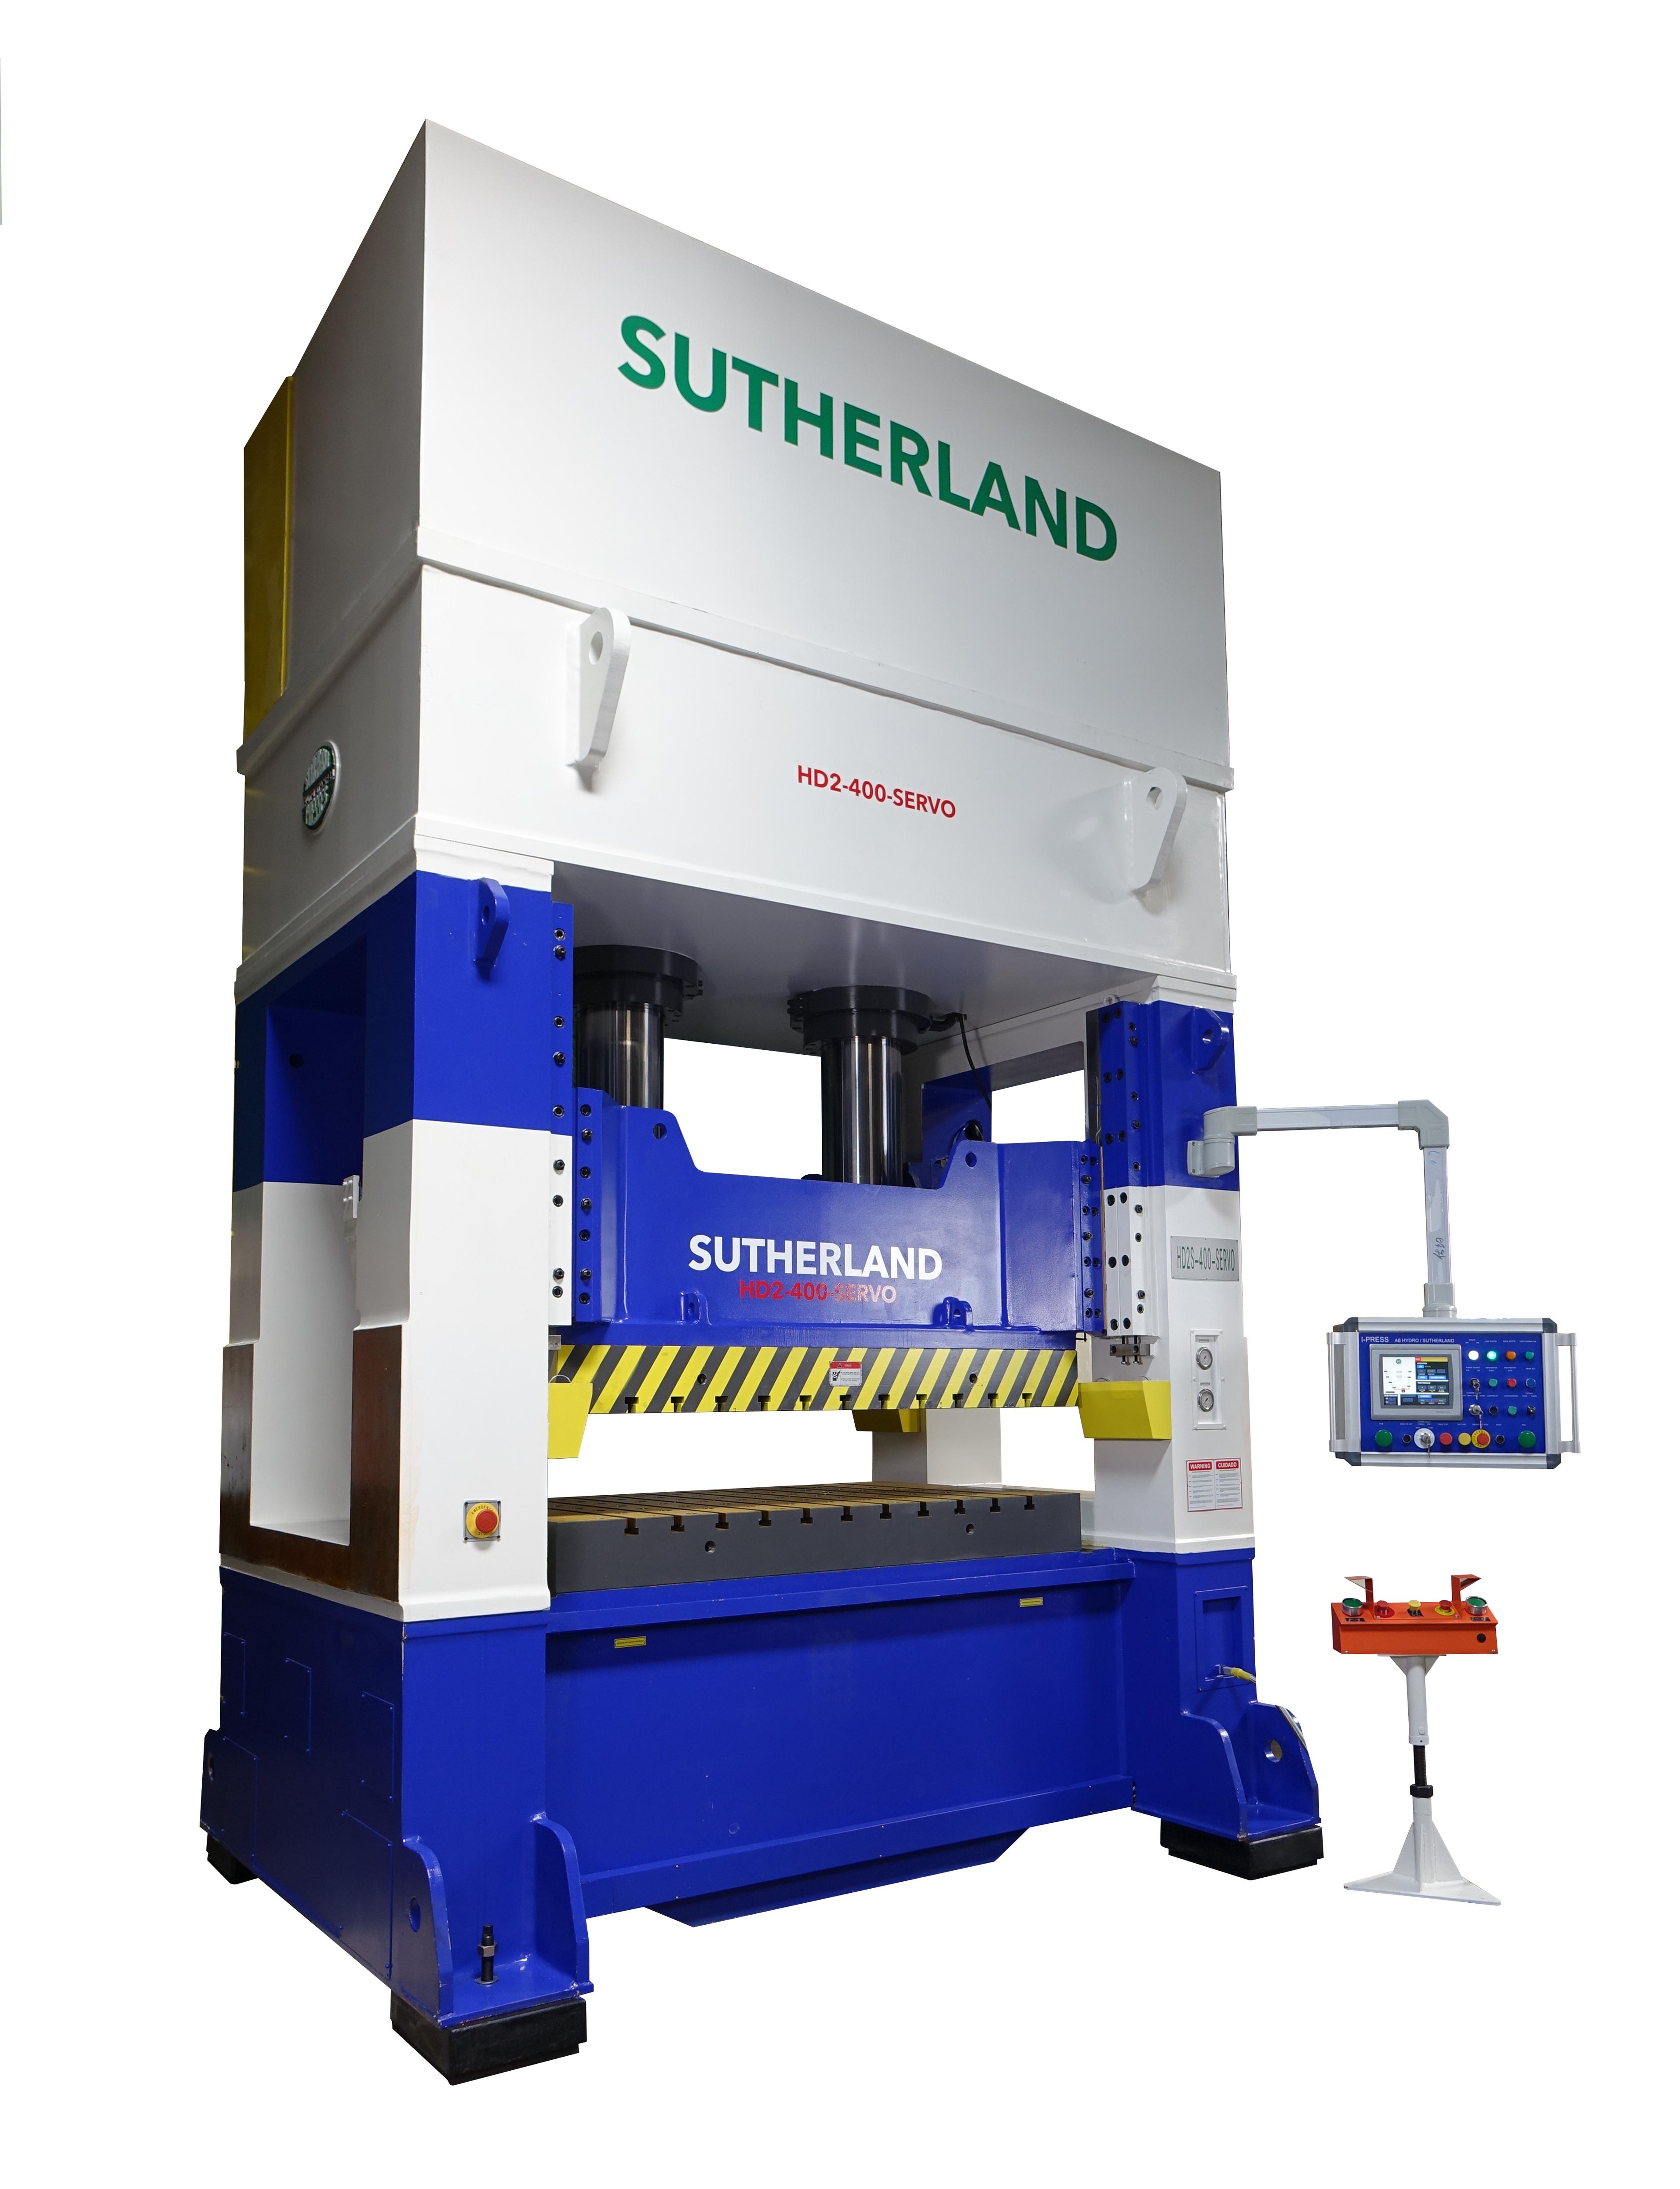 File:HD2-440 ton Servo Hydraulic Press jpg - Wikimedia Commons